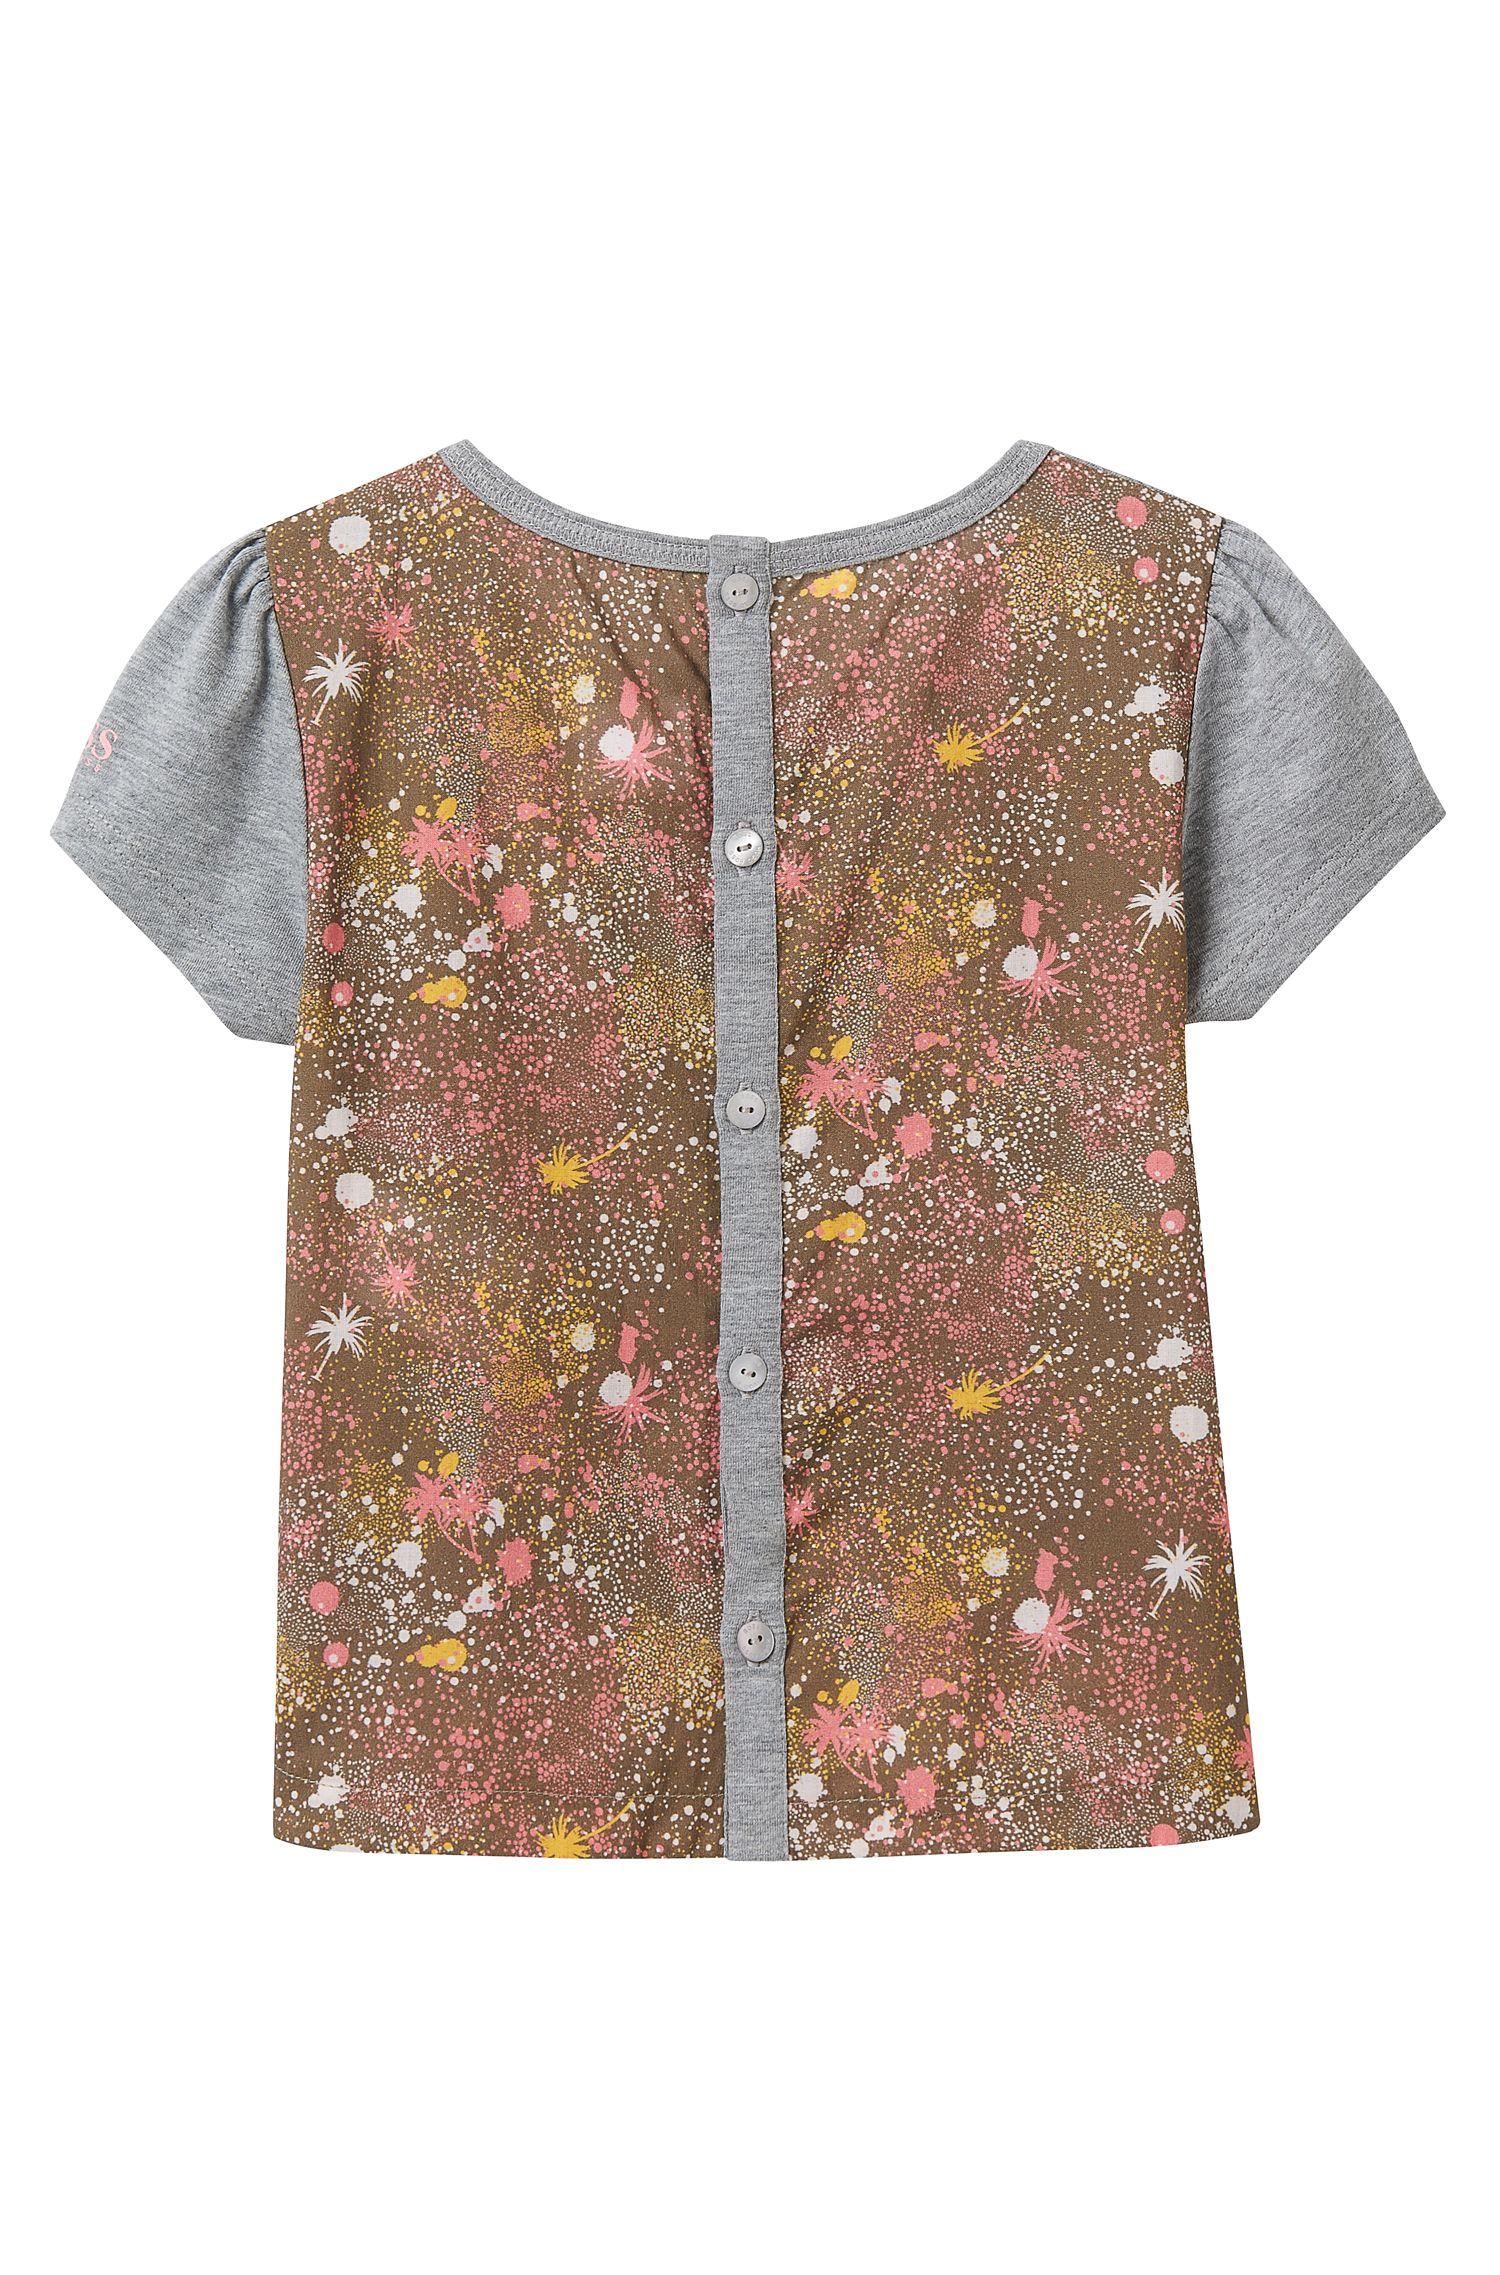 'J15341' | Girls Mixed Print T-Shirt